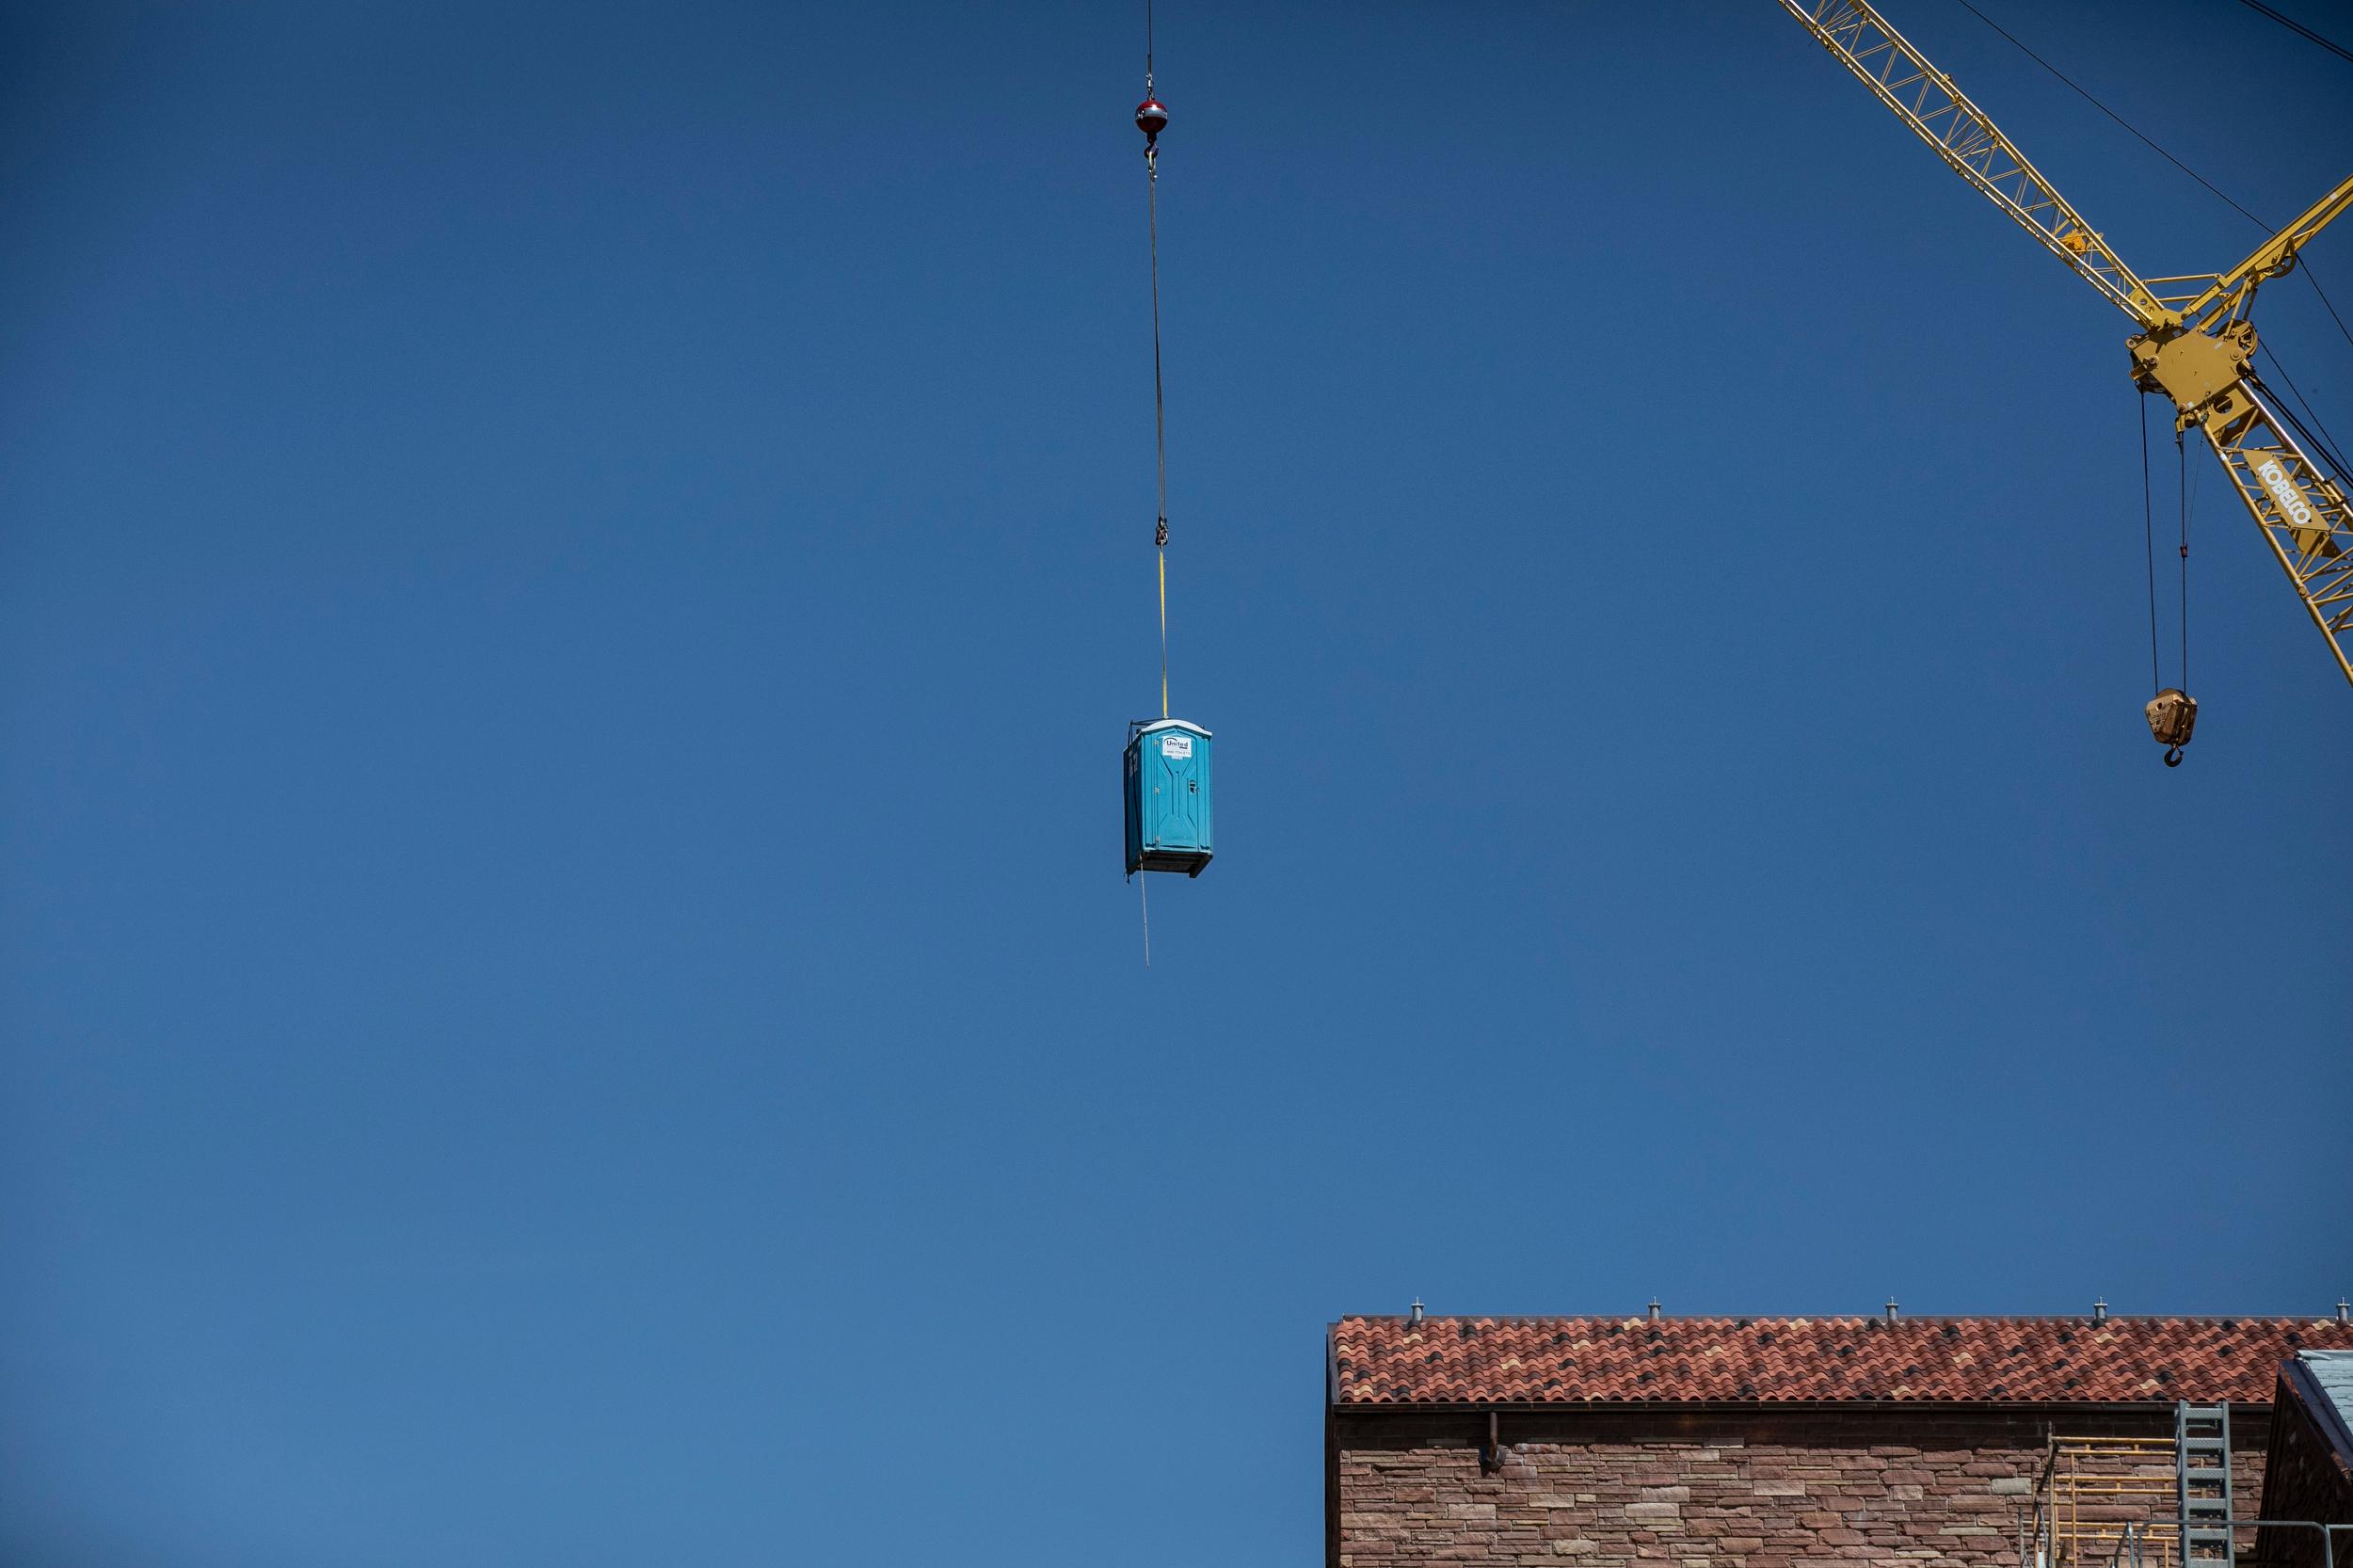 Crane lifts a portable toilet over a construction site at the University go Colorado at Boulder